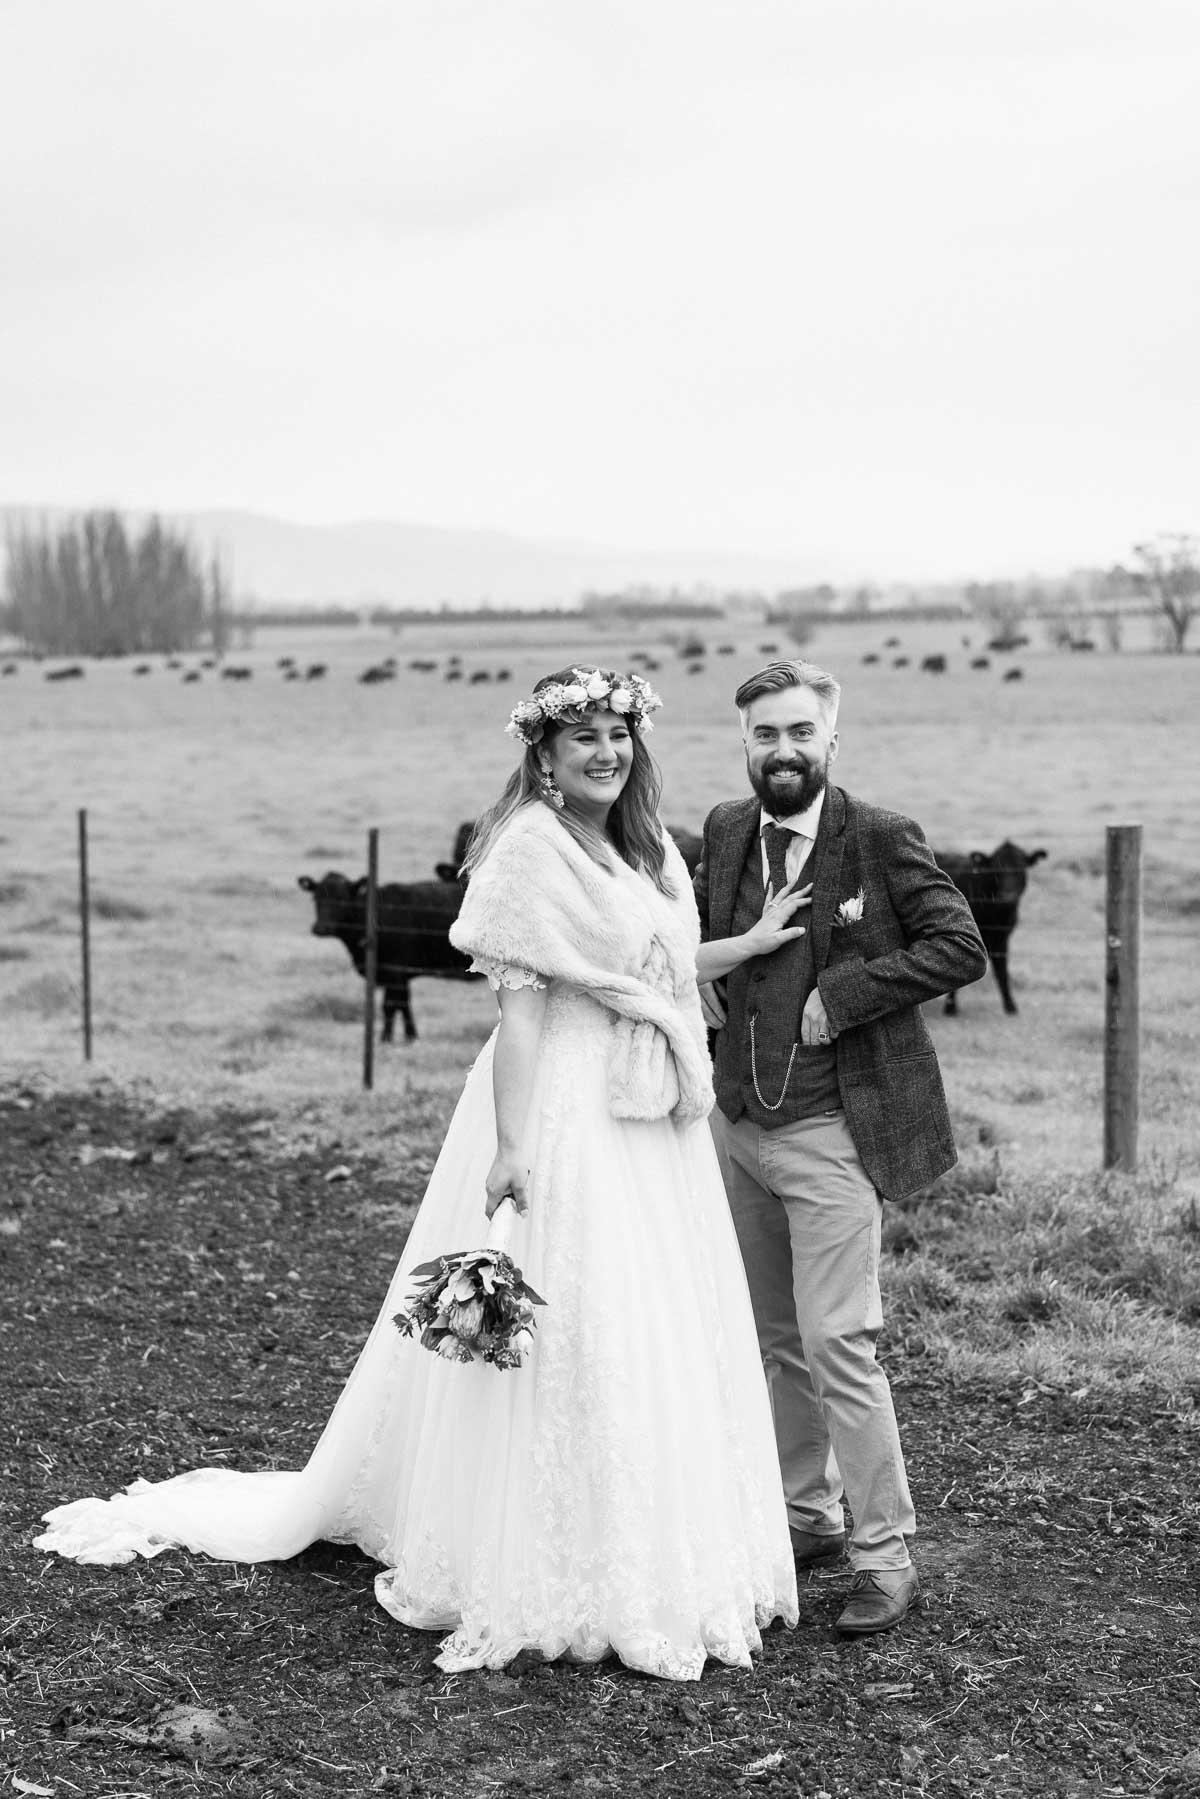 adams-farm-coldstream-yarra-valley-wedding-heart+soul-weddings-kel-jarryd-05714.jpg